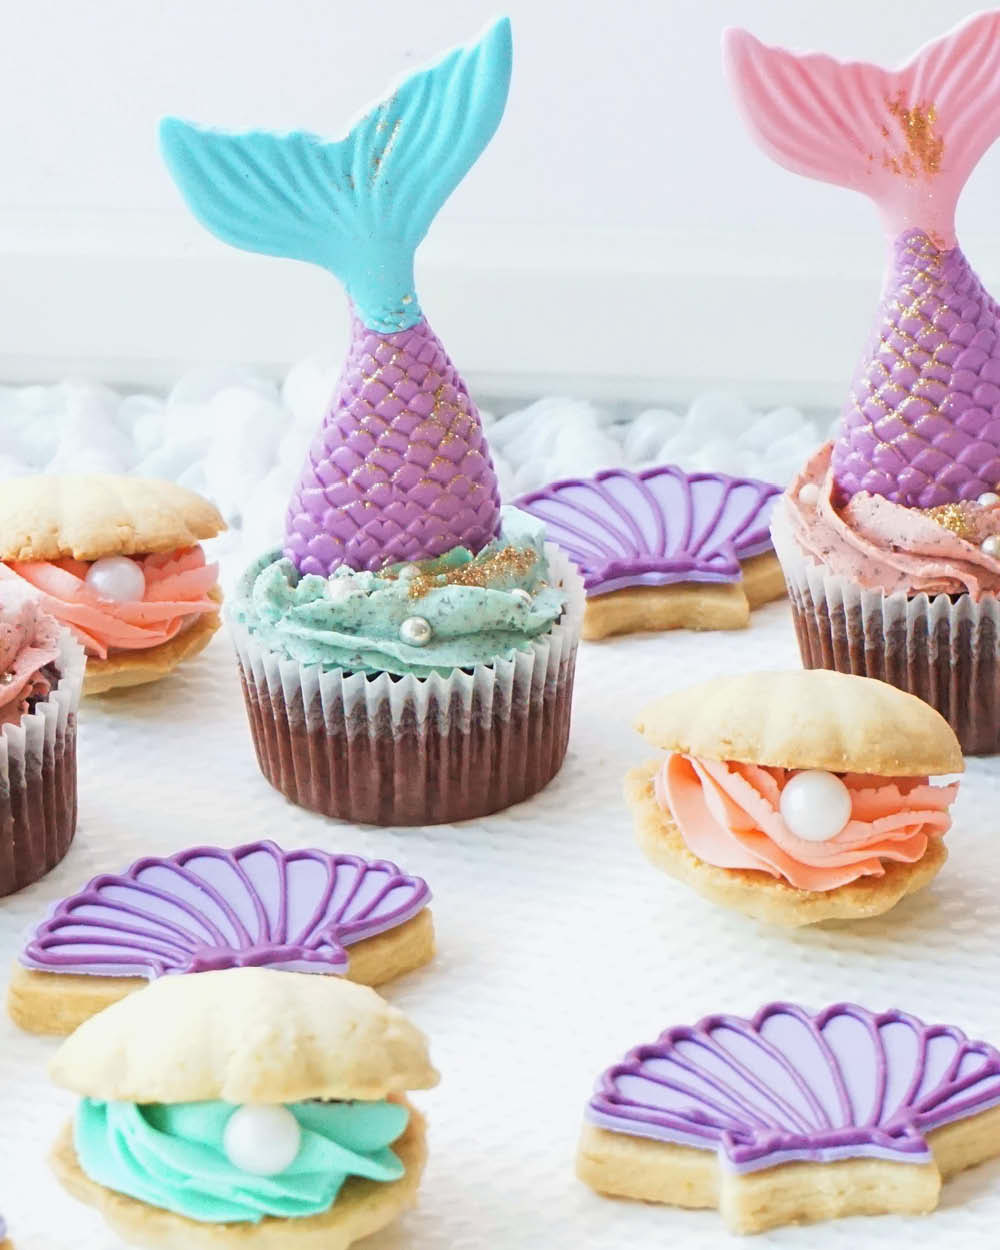 Cakes_By_Aranee_Perth_Drip_Cakes_Custom_Cakes_Wedding_Cakes_Macarons_Cupcakes_Personalised_Cookies_OTHER_DESSERTS_Gallery1.jpg